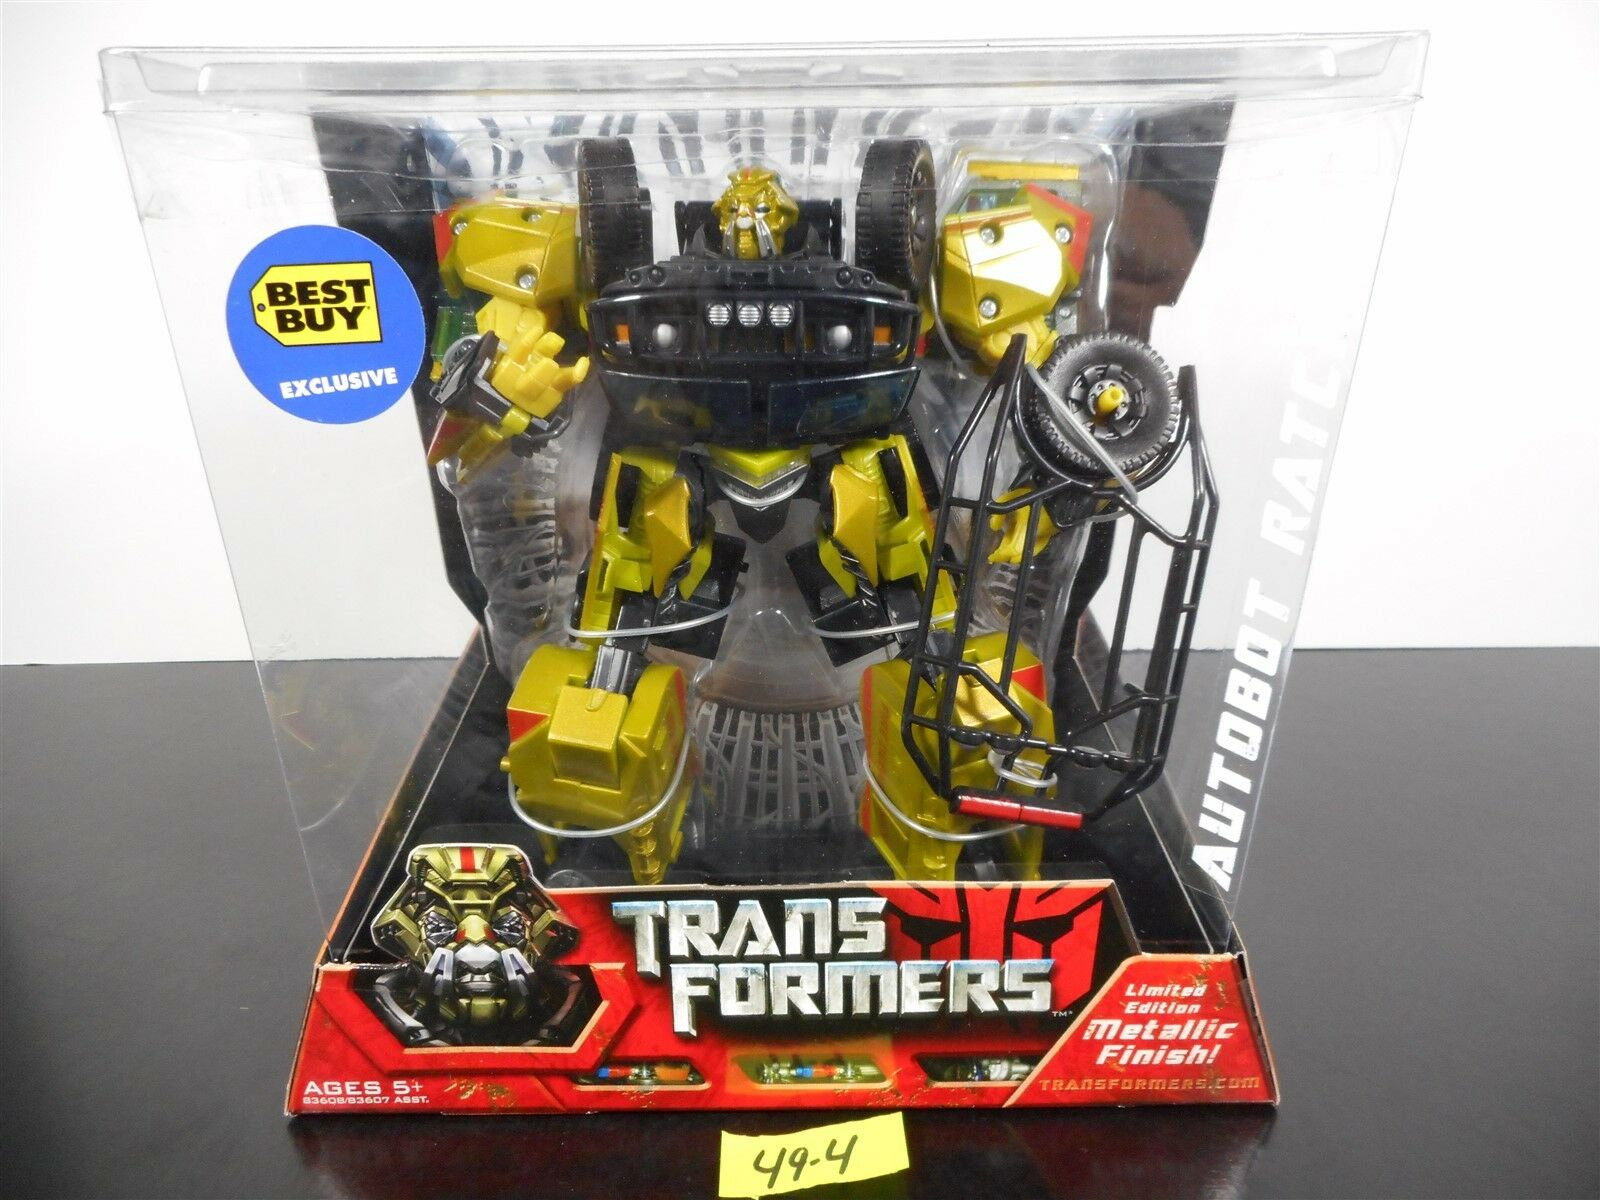 Transformatoren ratchet limited edition metallic - finish Beste buy exklusive 49-4